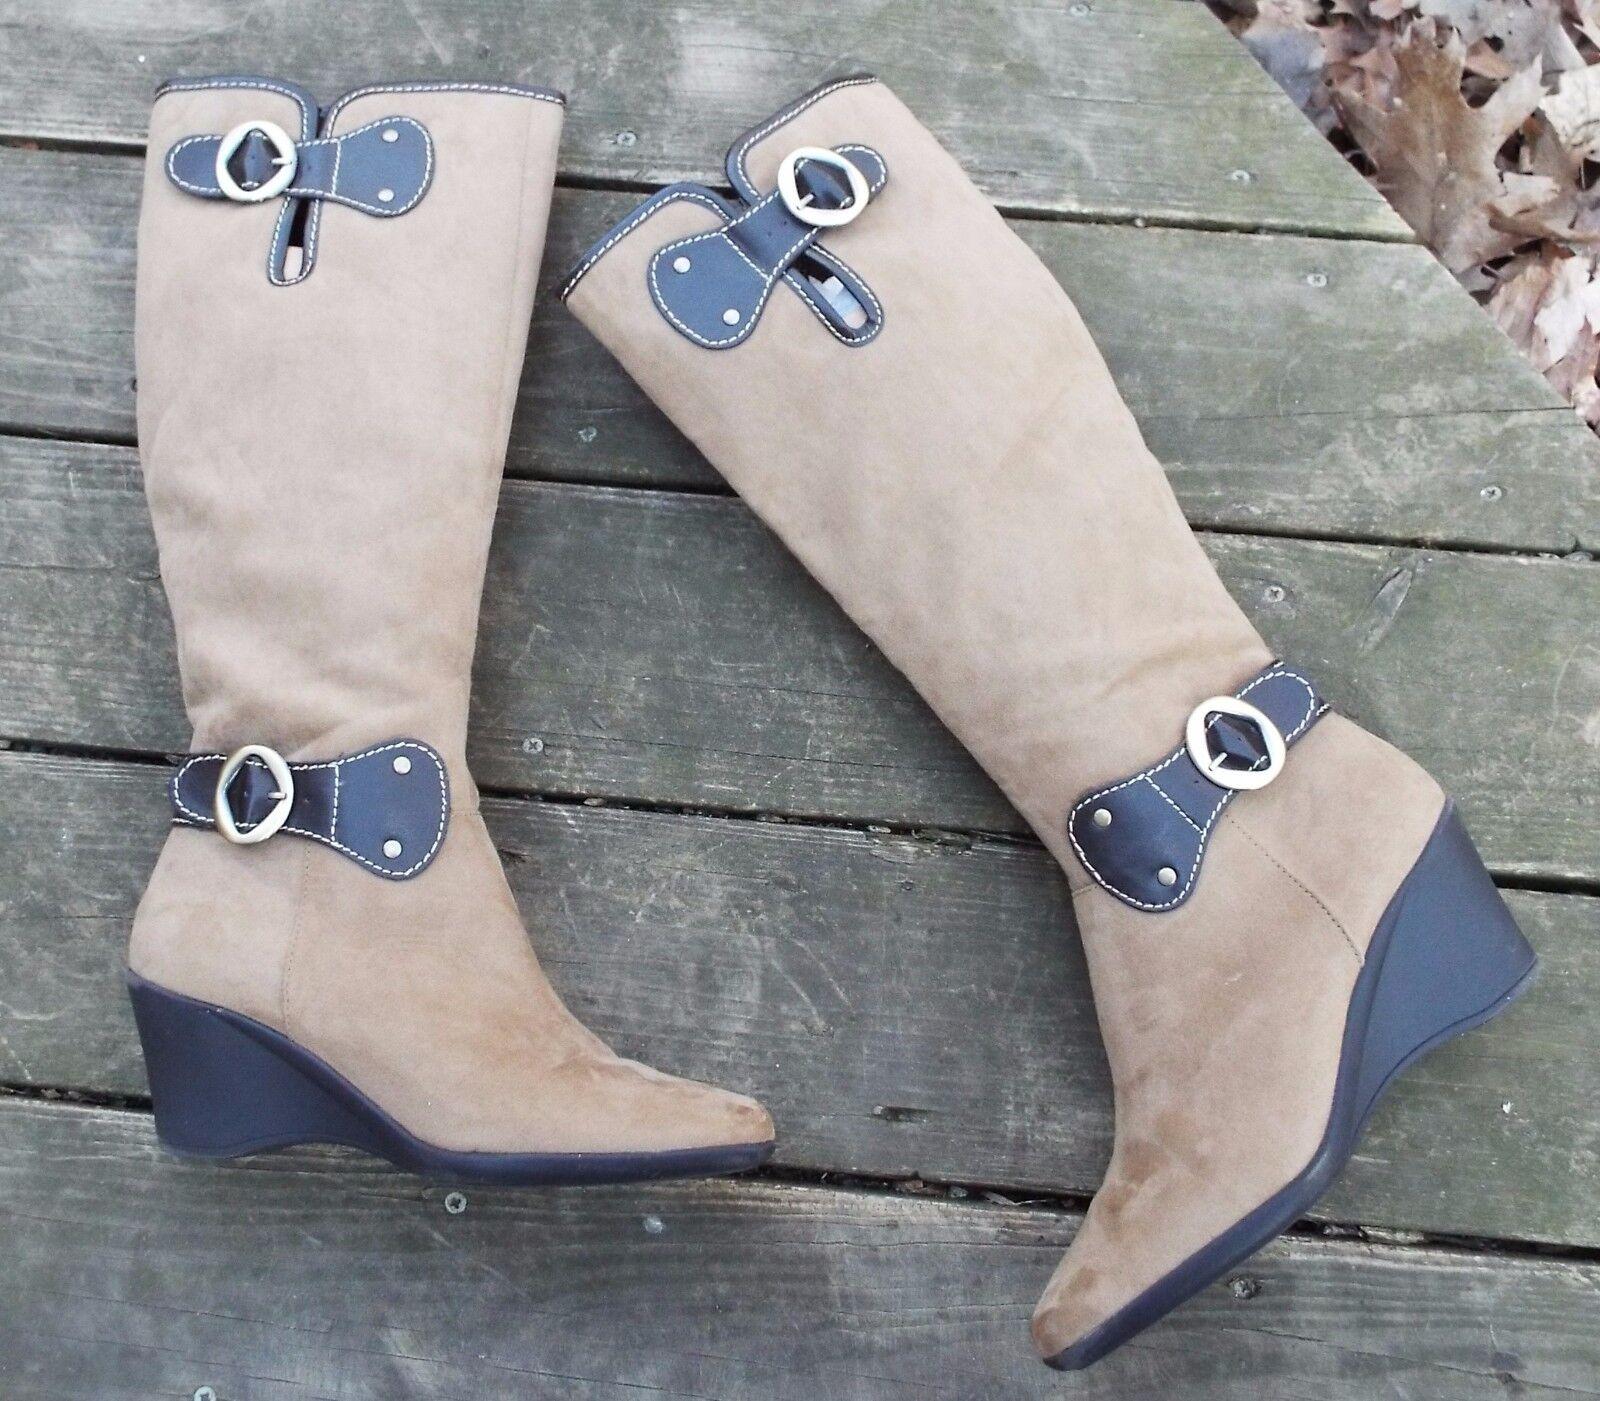 NWOB AEROSOLES  WONDERLING BOOTS,  Tan Knee-High Wedge Boots, Women's Size 9.5